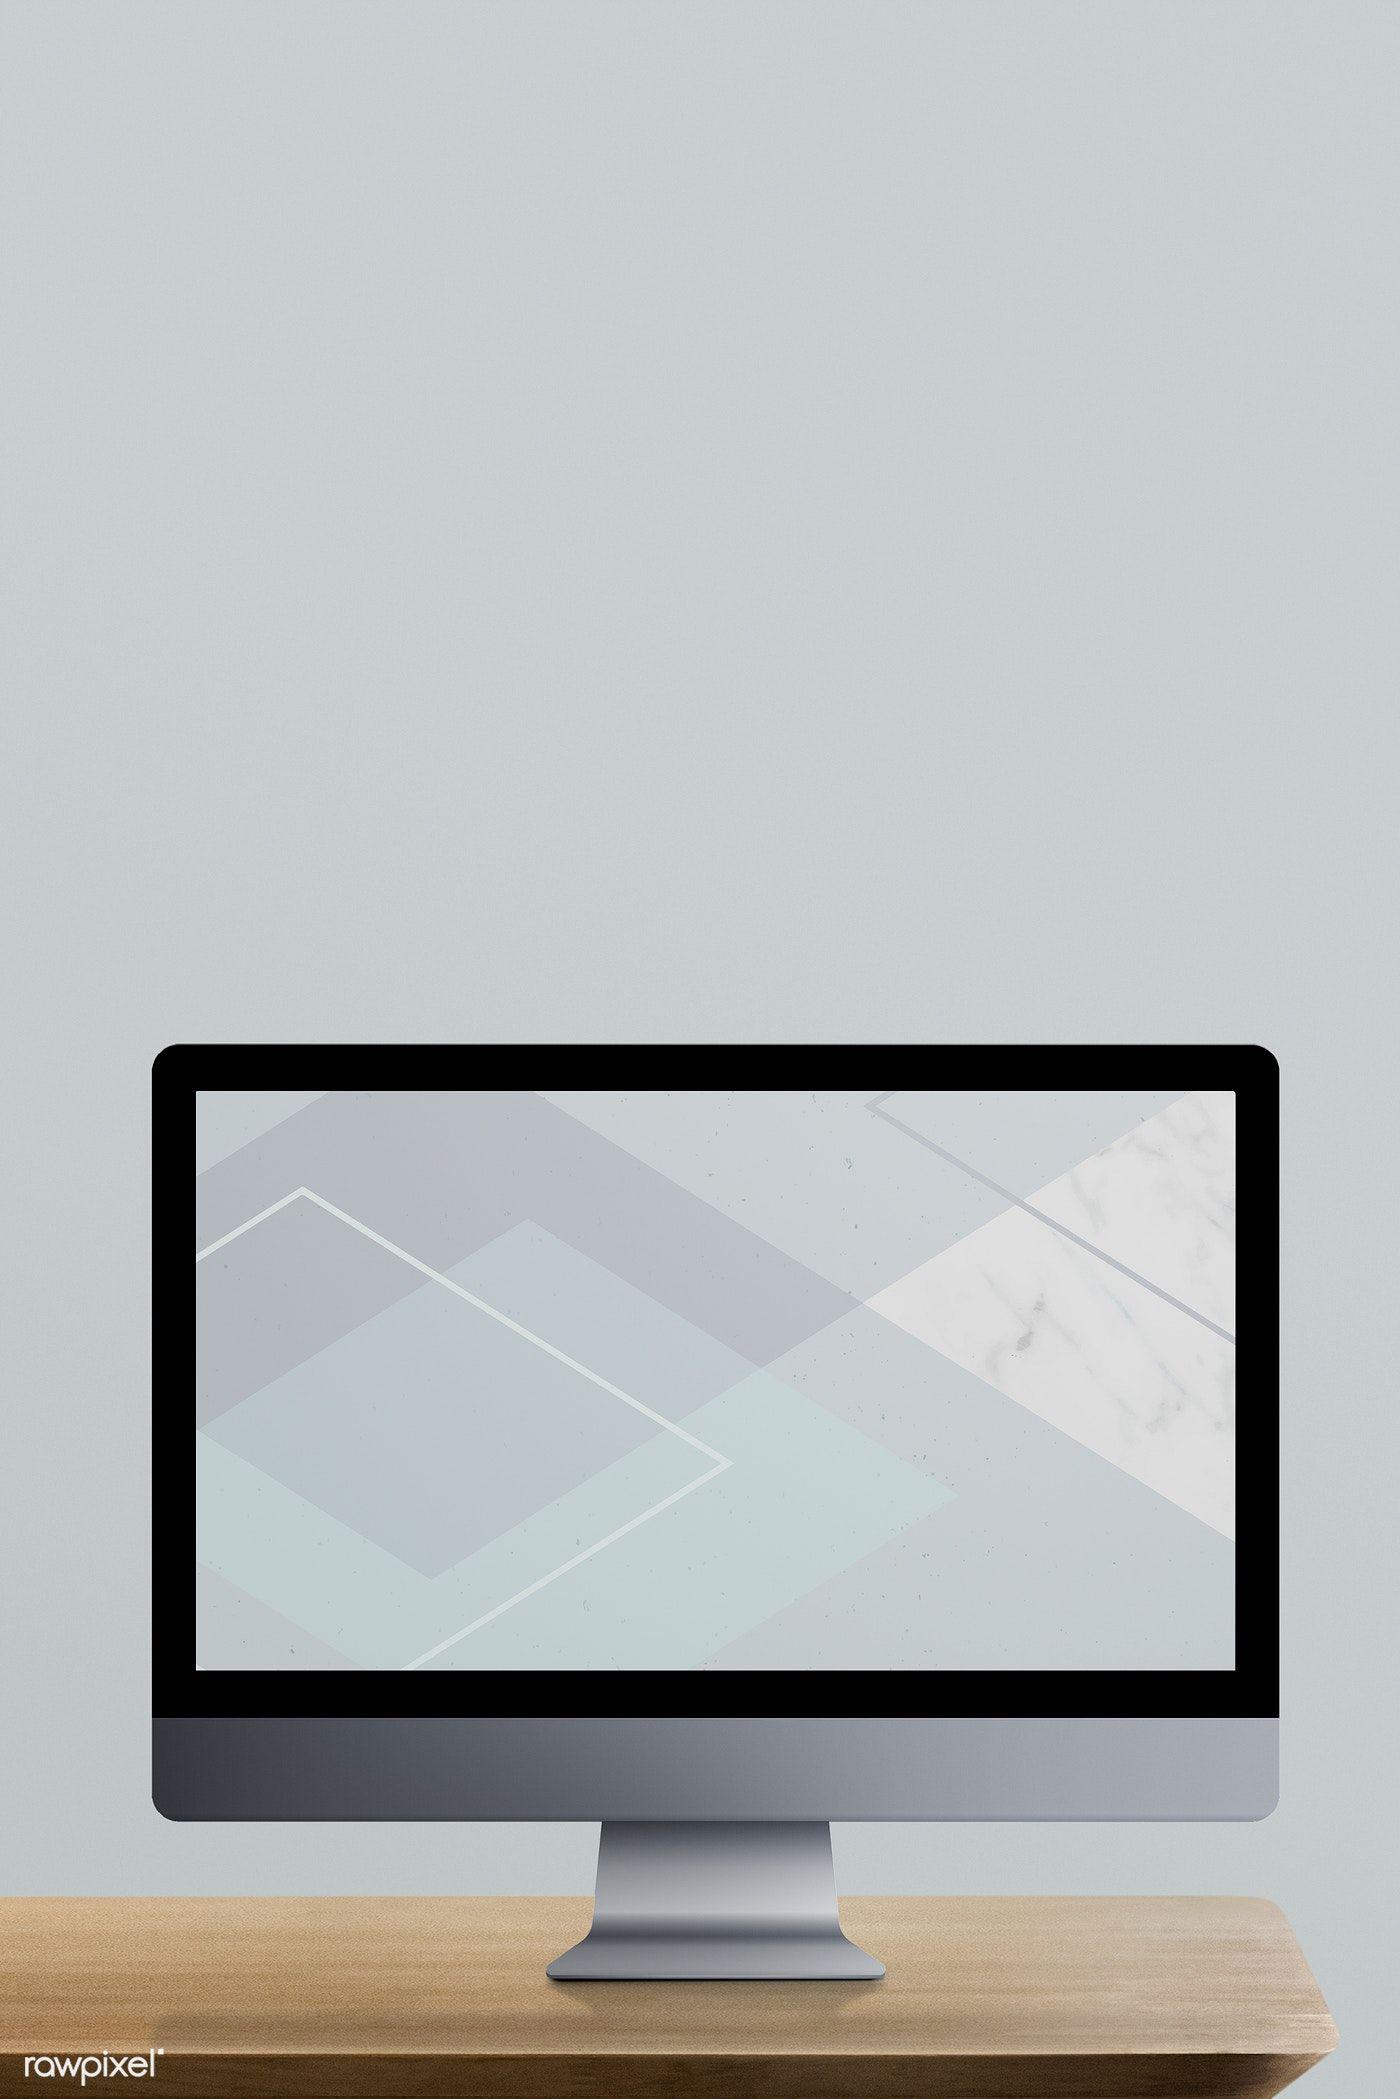 Download Premium Psd Of Desktop Computer With Screen Mockup On A Wooden Desktop Computers Computer Mockup Computer